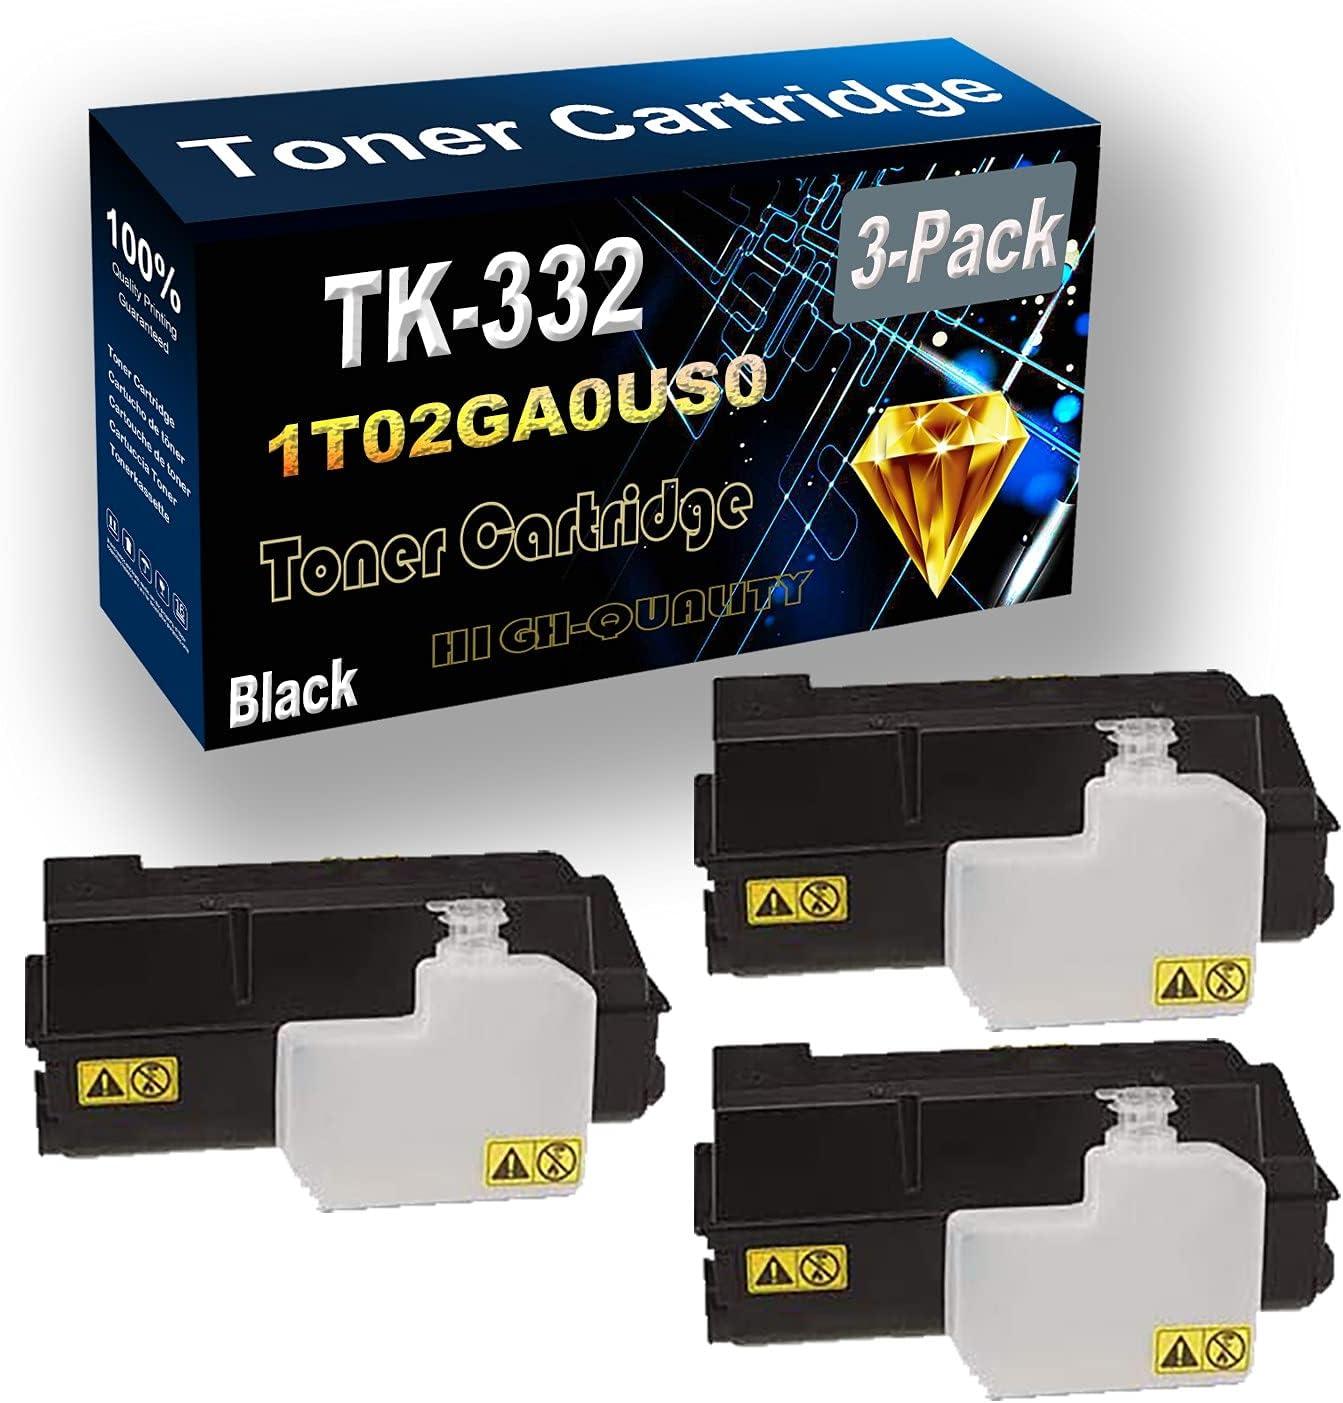 Remanufactured Toner Cartridge Replacement for Kyocera TK332 TK-332   1T02GA0US0 for Kyocera FS-4000DN Printer (3-Pack Black)